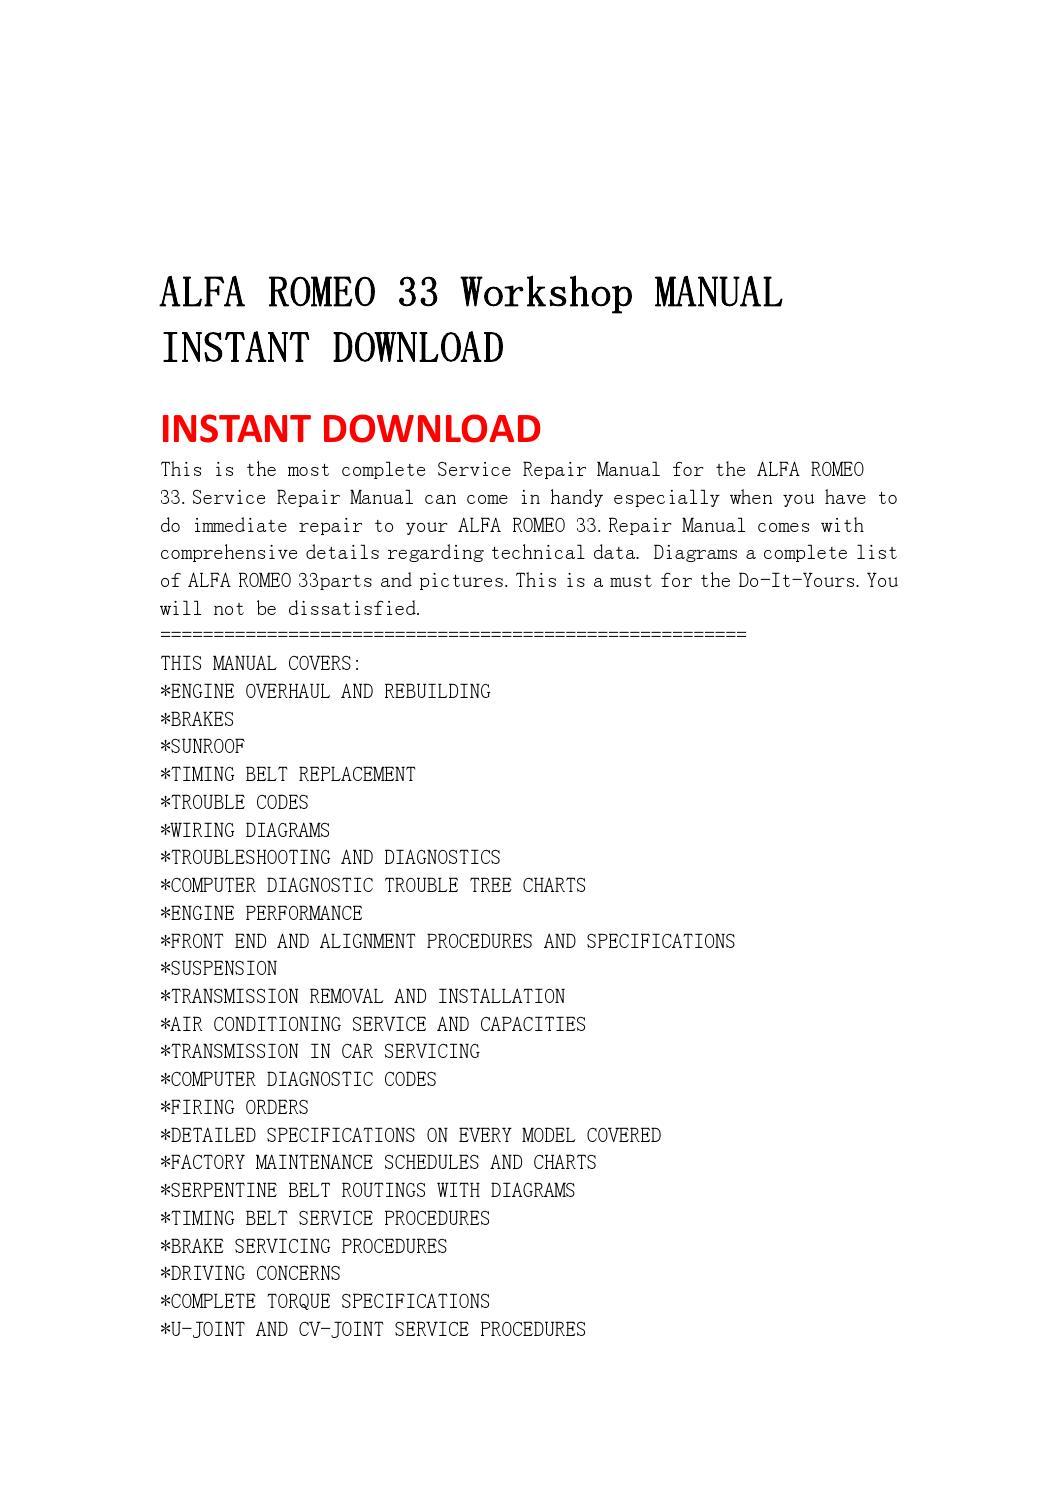 Alfa Romeo 33 Workshop Manual Instant Download By Jfhsenf7ye